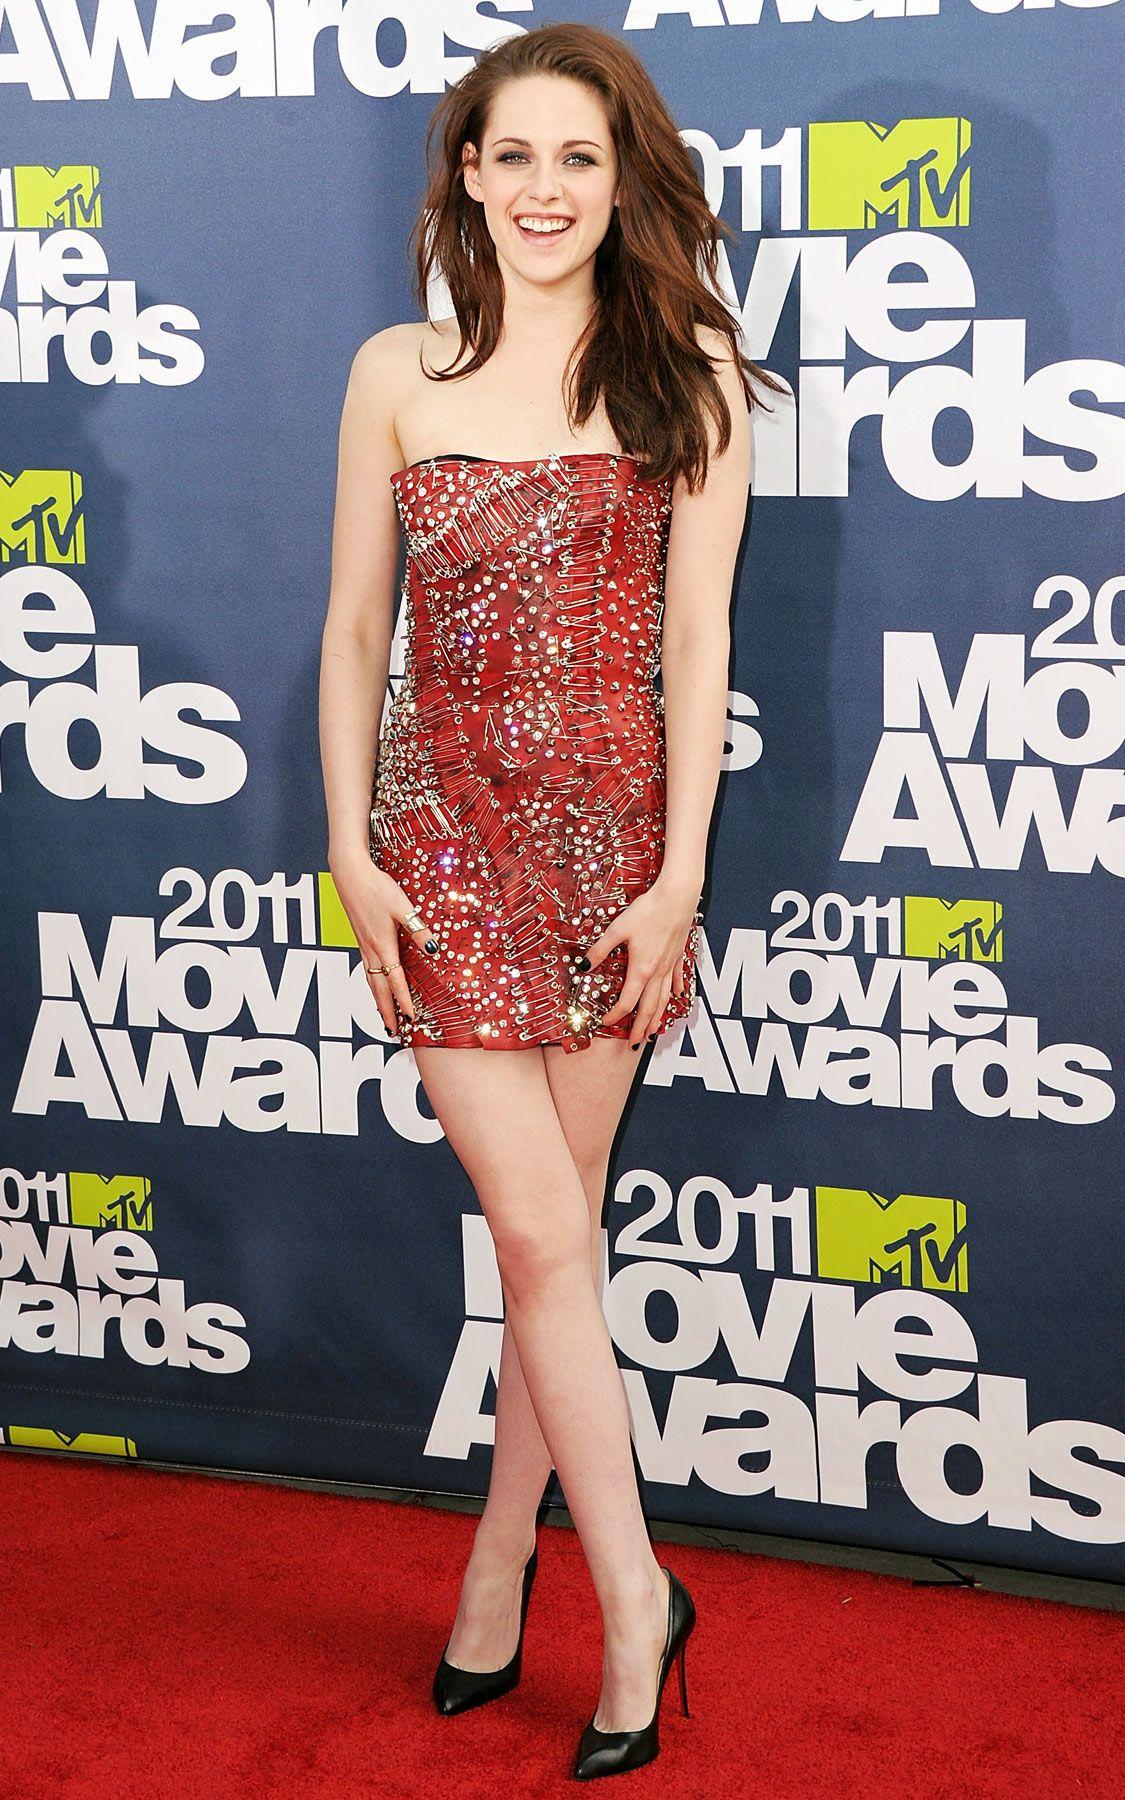 Kristen Stewart's Most Stunning Red Carpet Looks | Carpets, Red ...